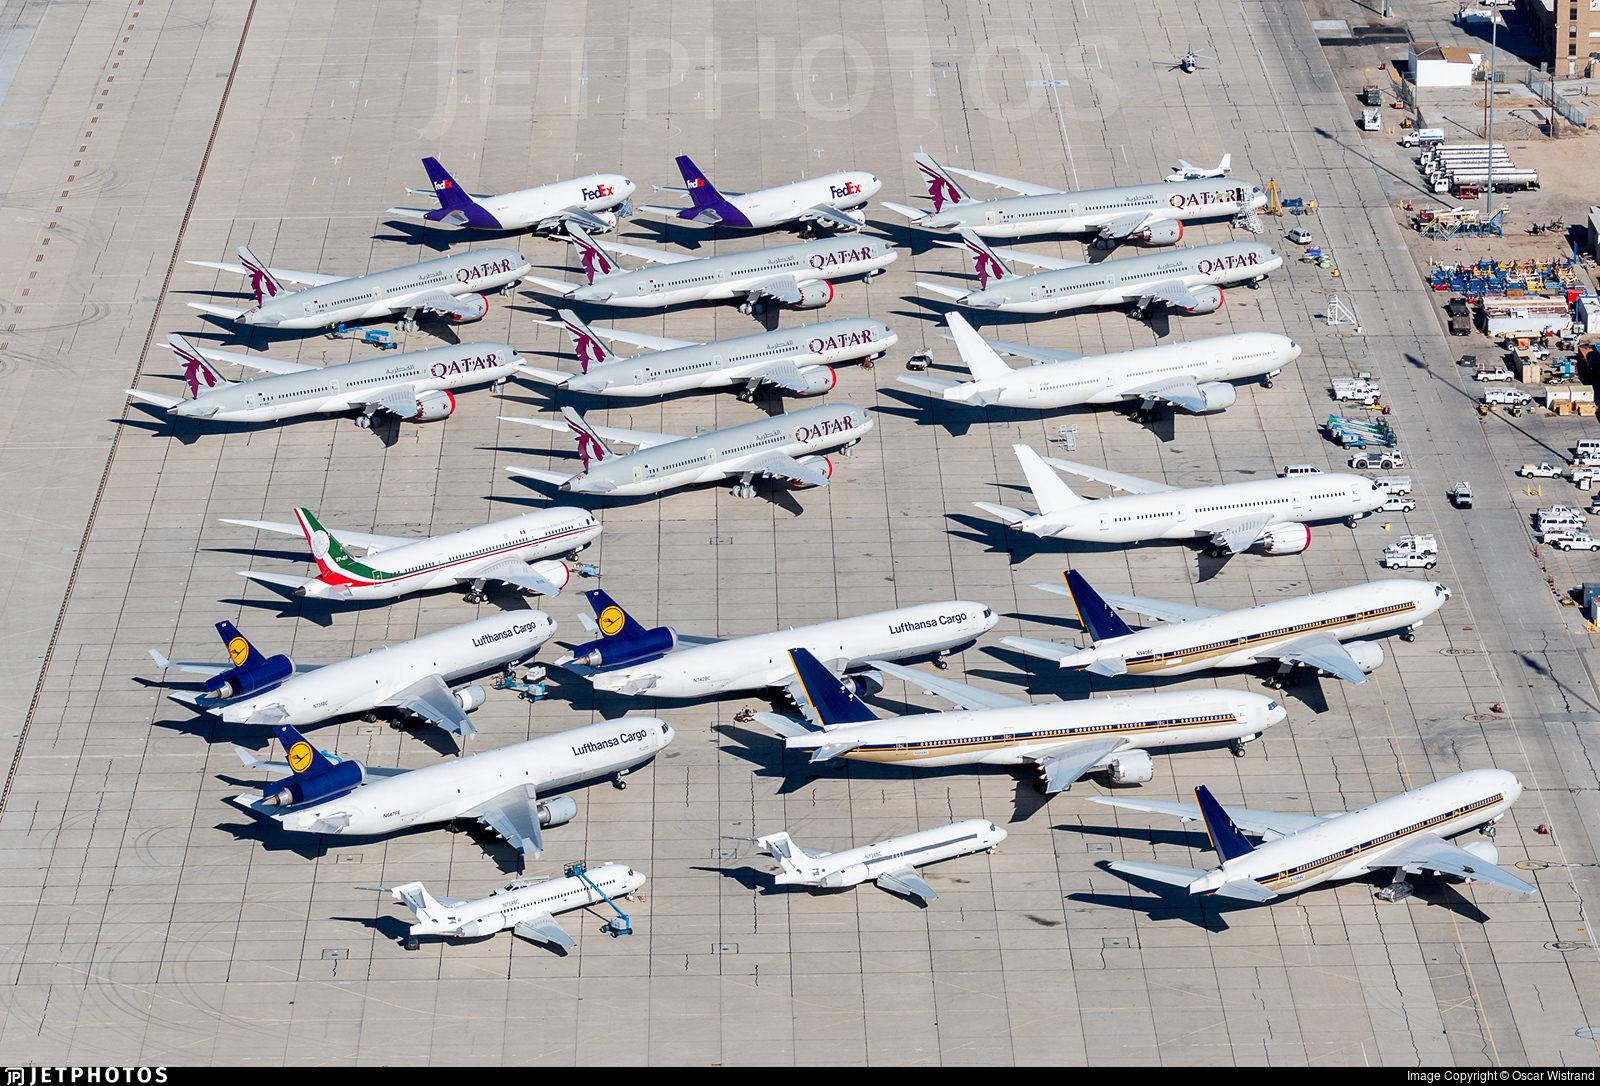 Victorville aircraft storage